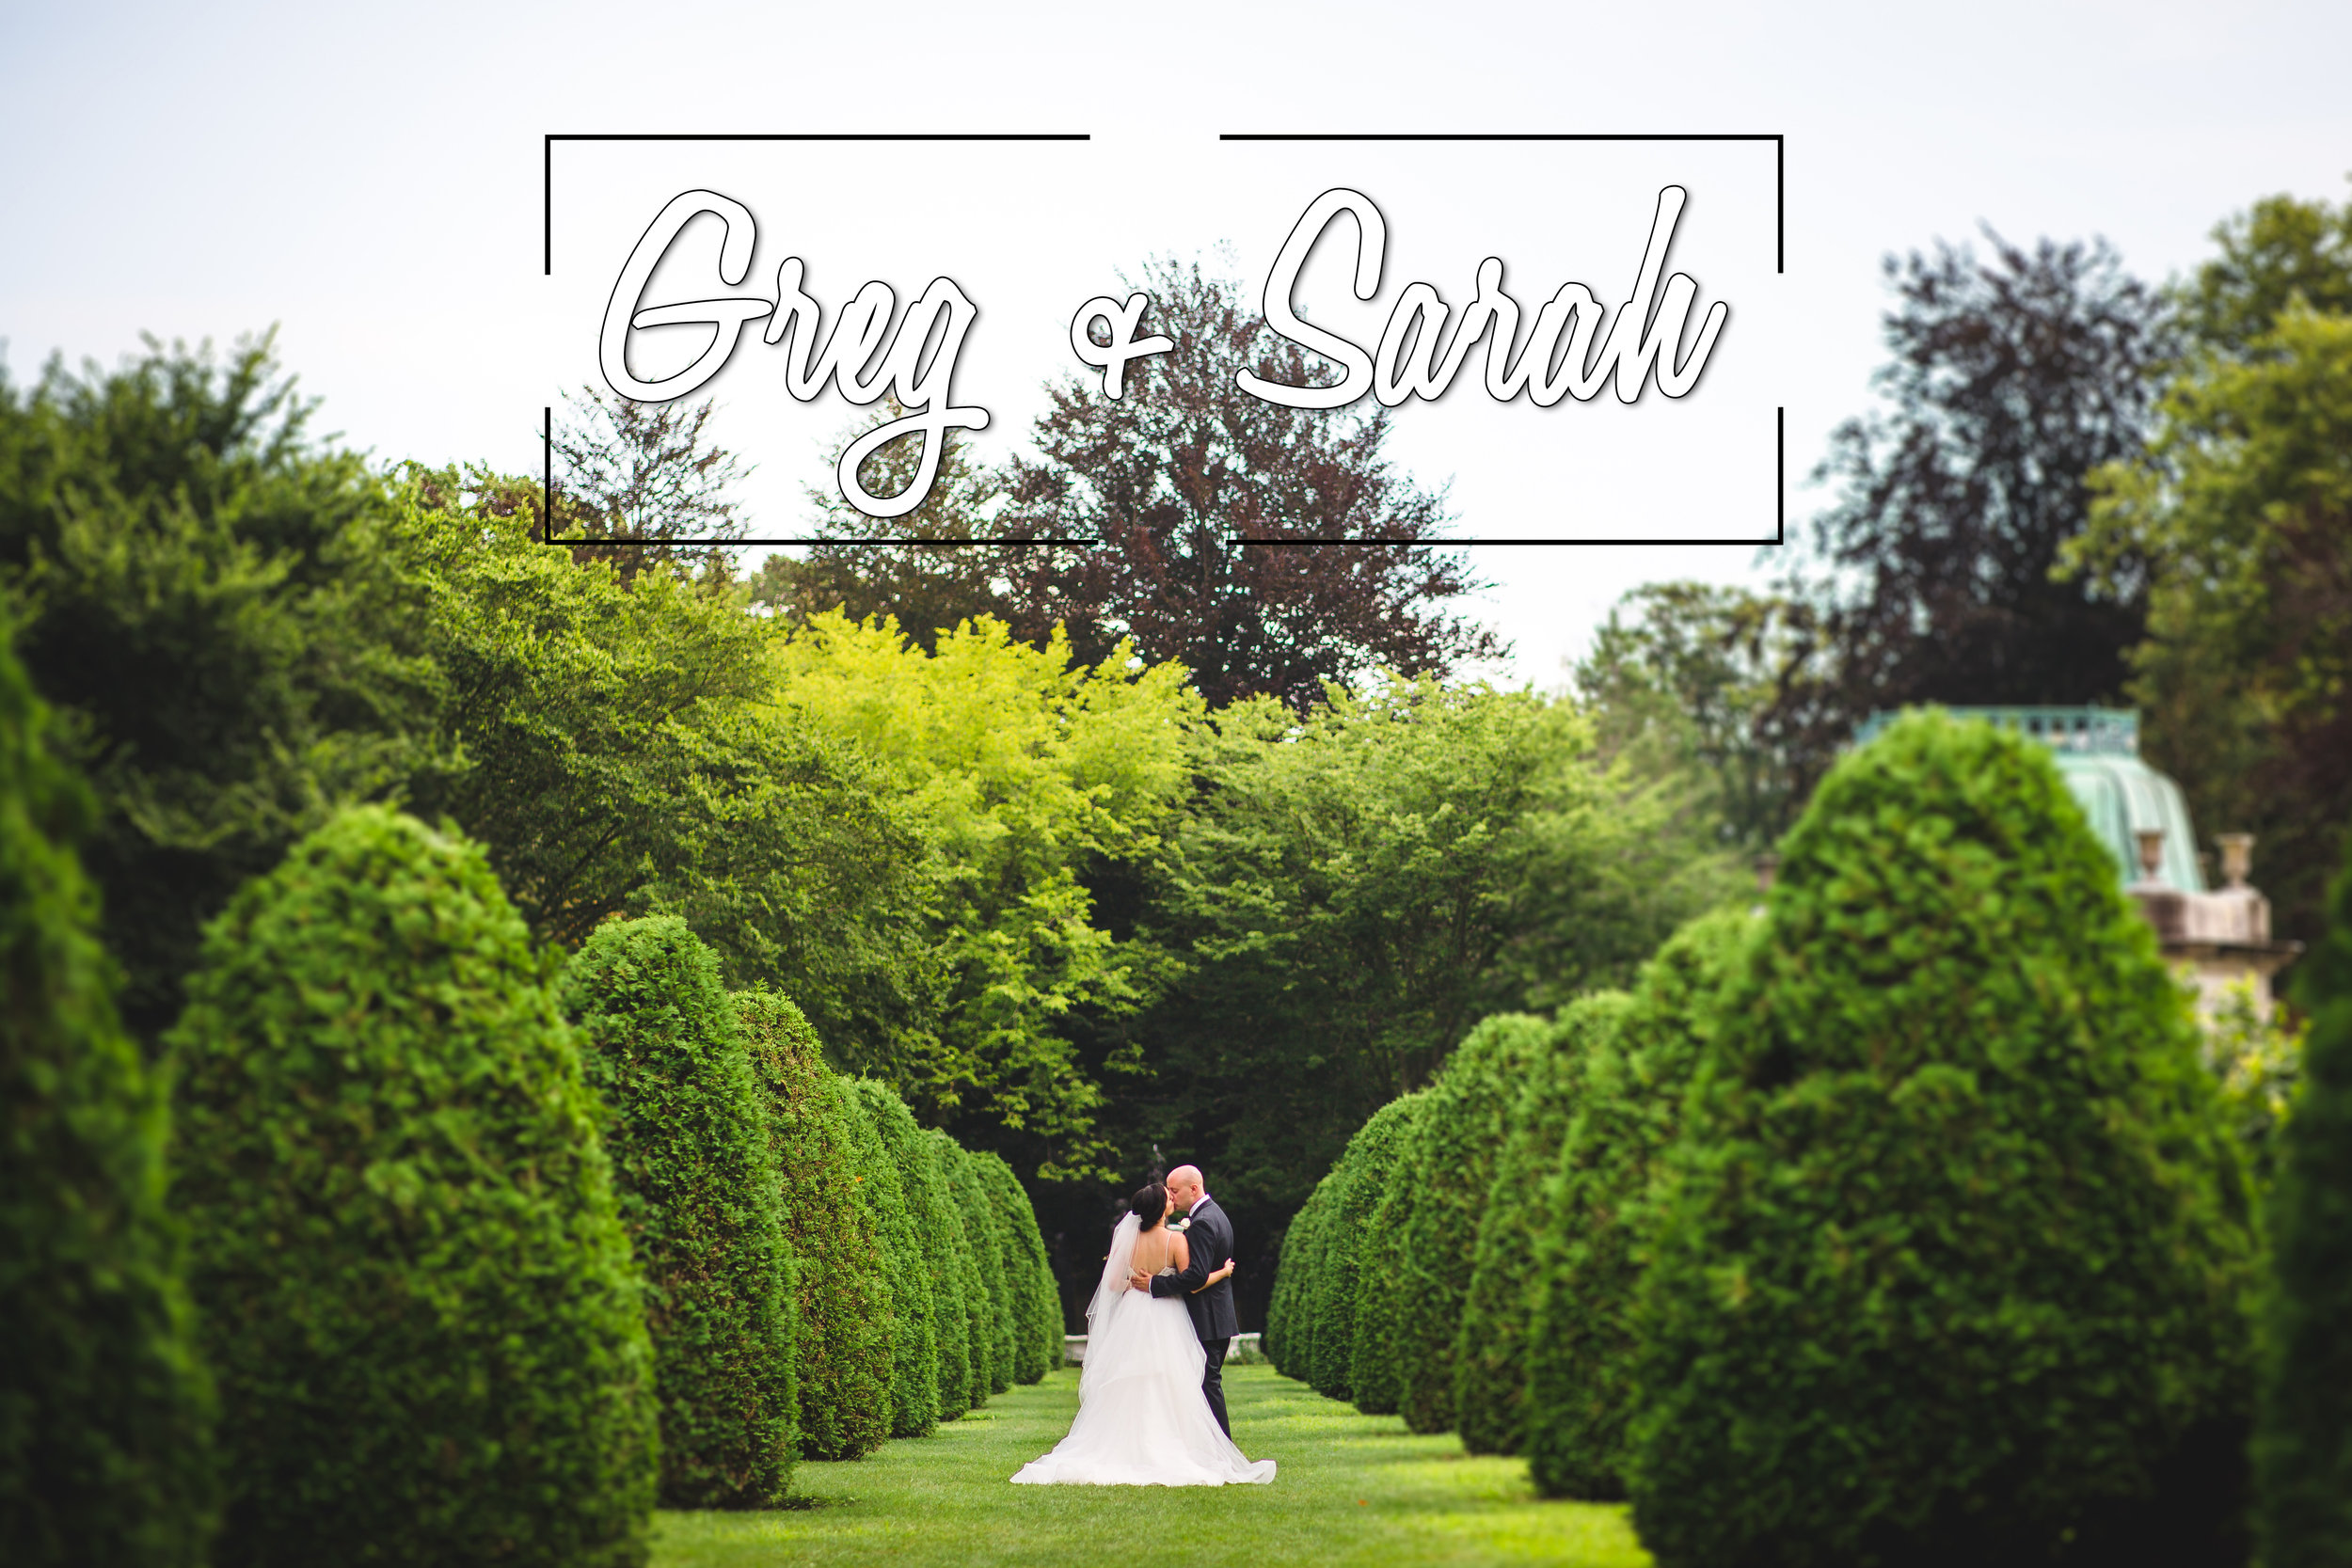 467-Greg&Sarah_BLOGcouplessession-9U6A0775.jpg